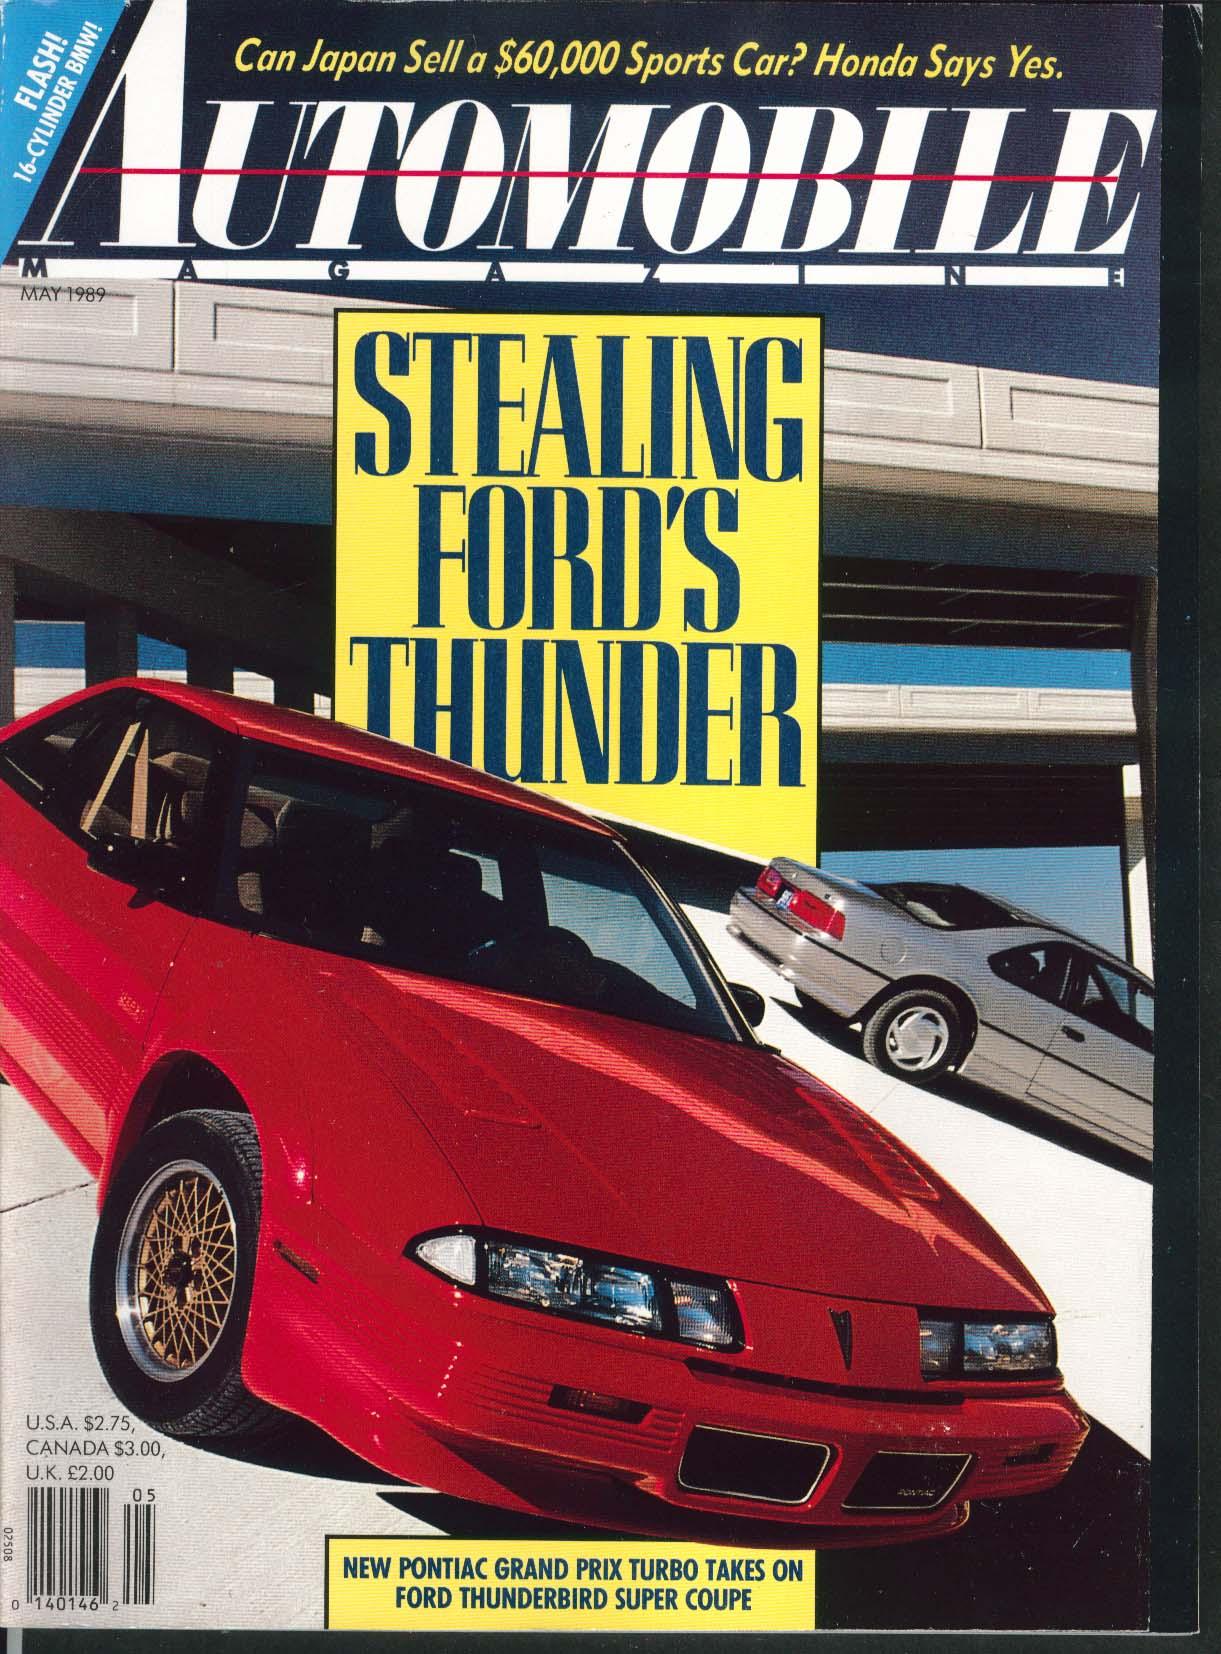 AUTOMOBILE Pontiac Grand Prix Turbo Acura Honda Prelude Si 4WS 5 1989